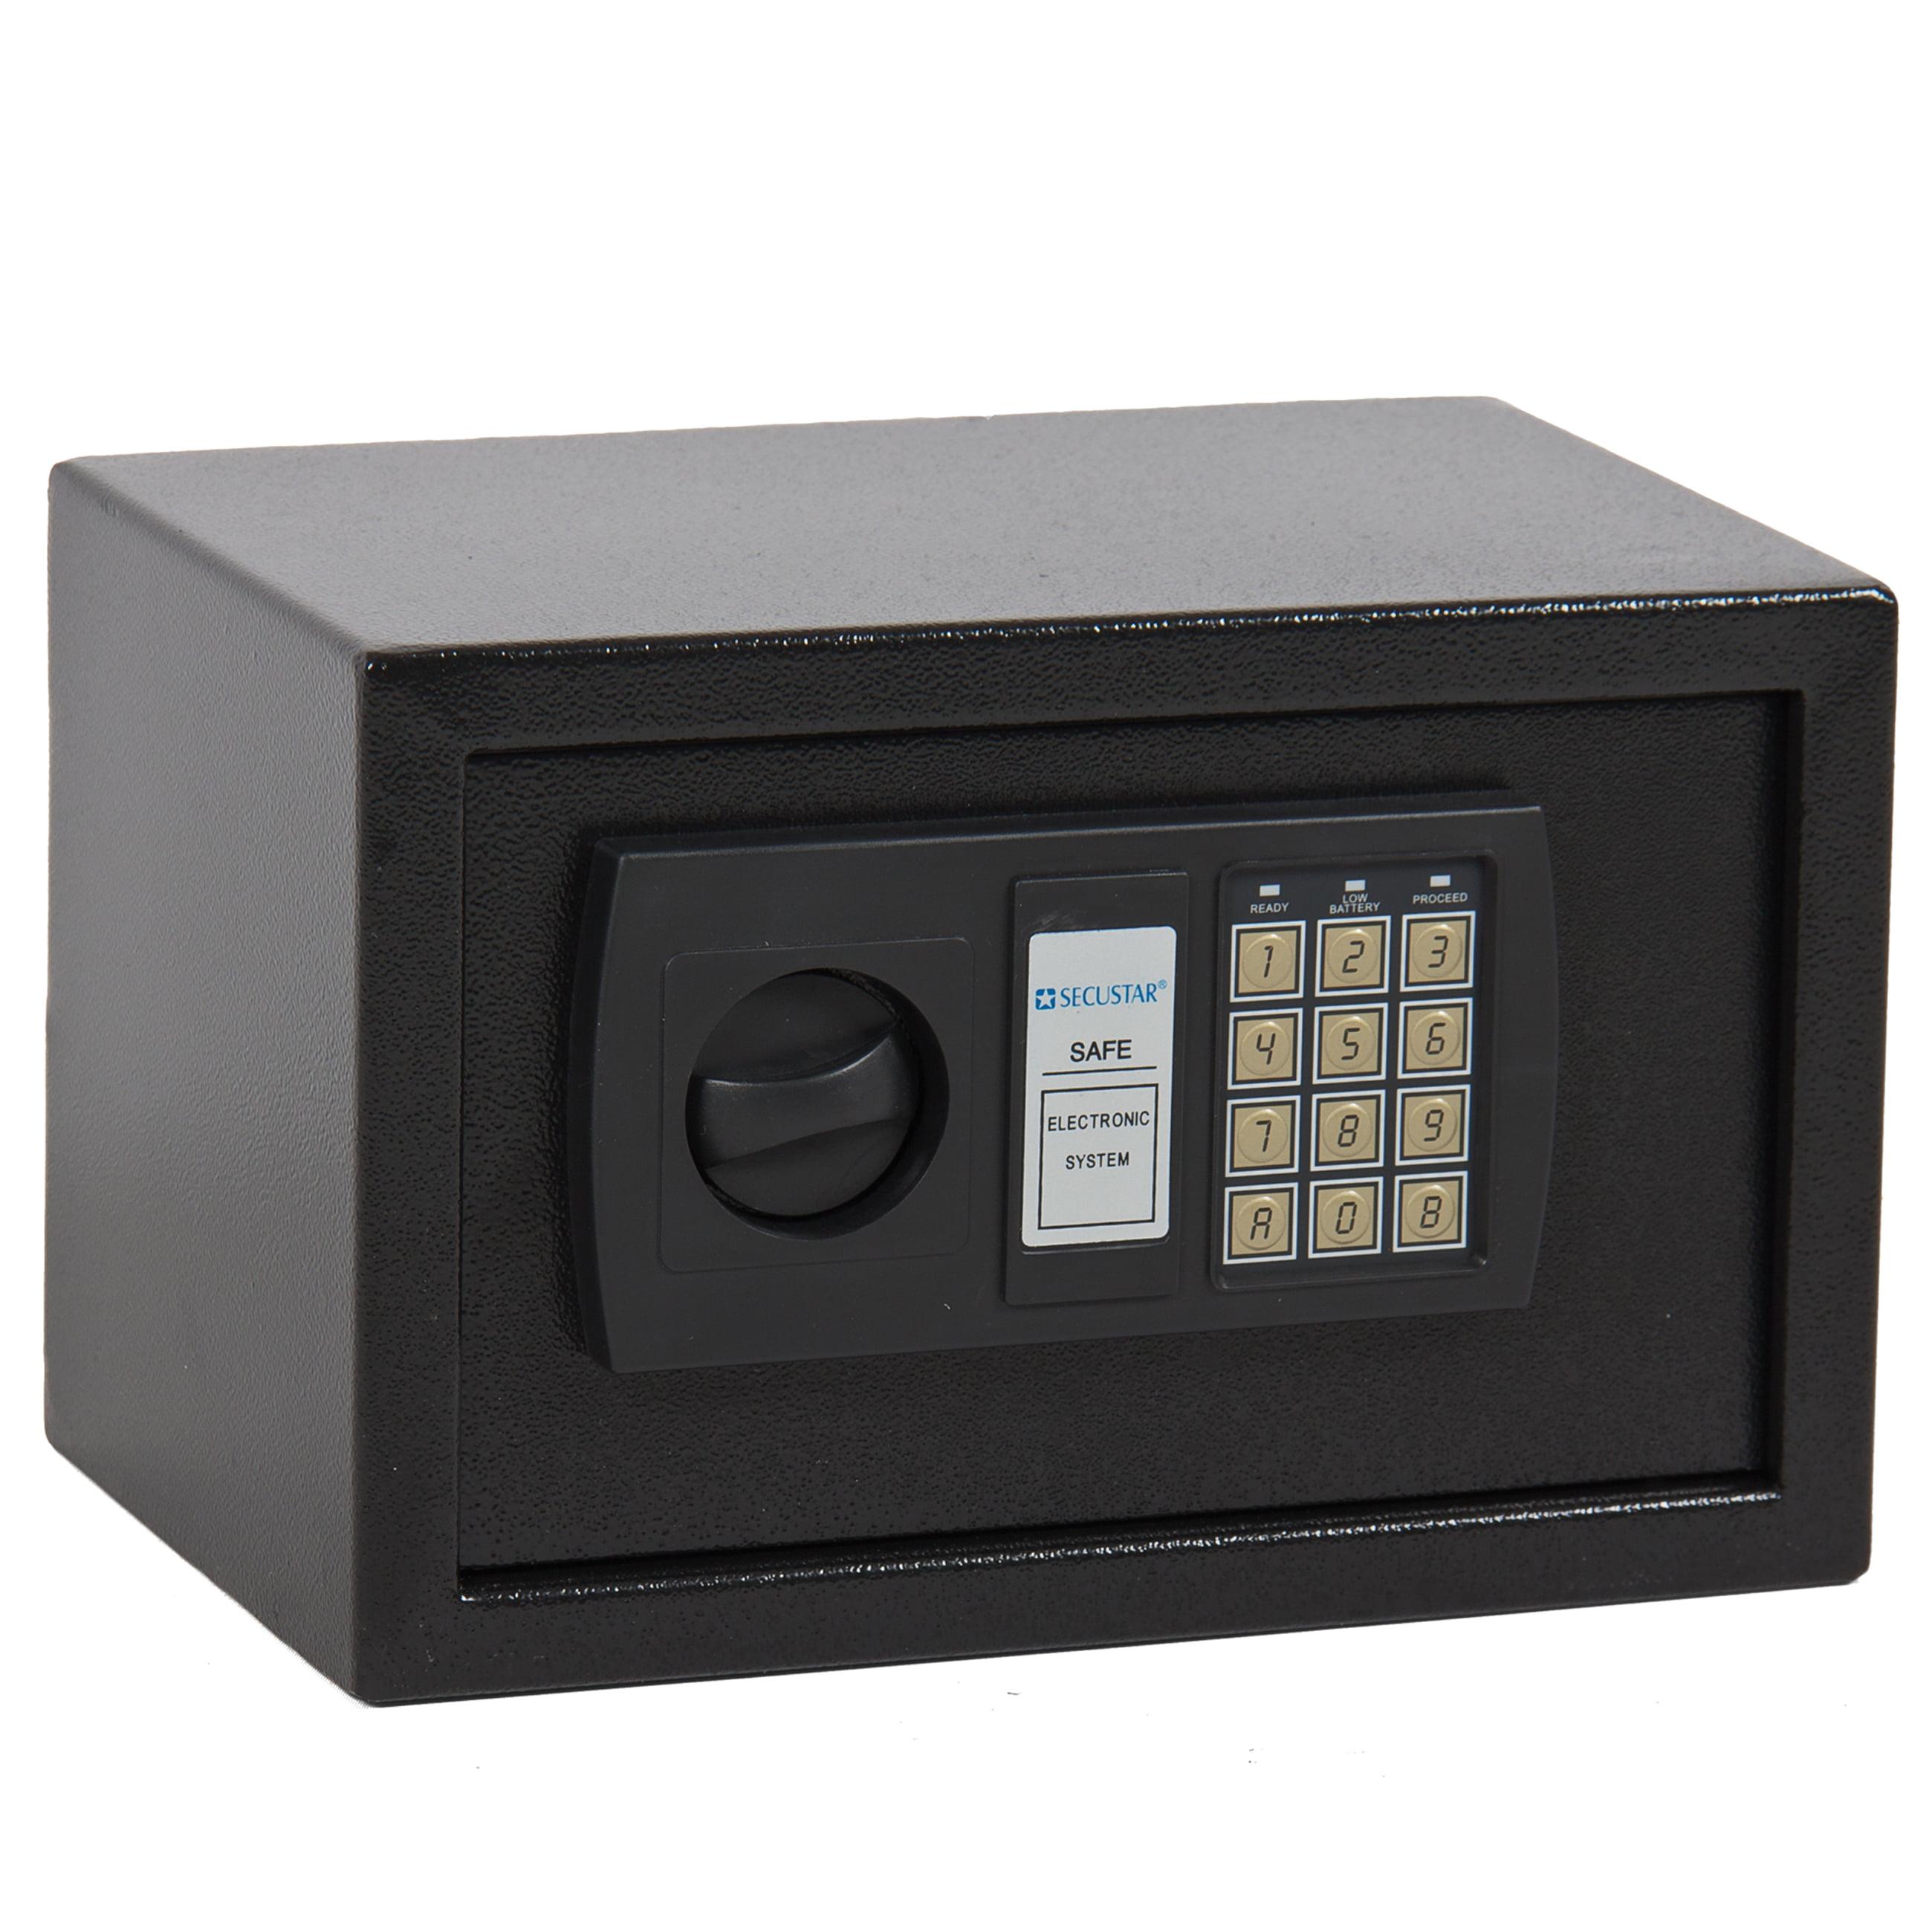 0.3CF Electronic Digital Lock Keypad Safe Box Home Security Gun Cash Jewel  Black - Walmart.com